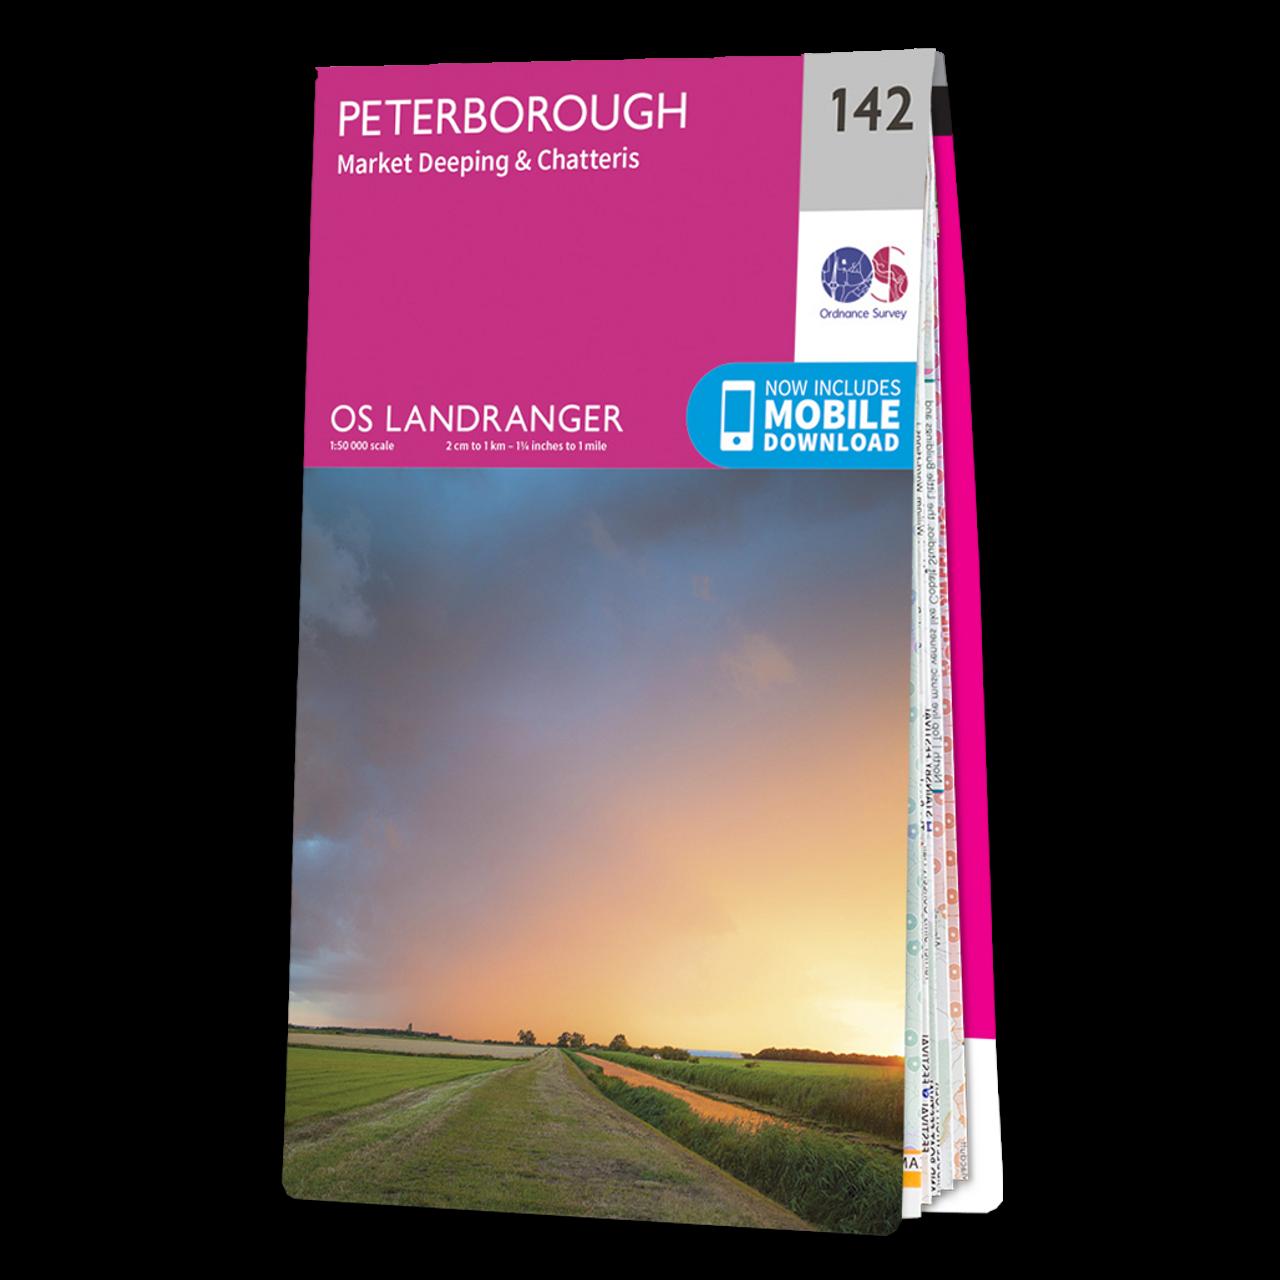 Map Of Peterborough -market DeepingandChatteris